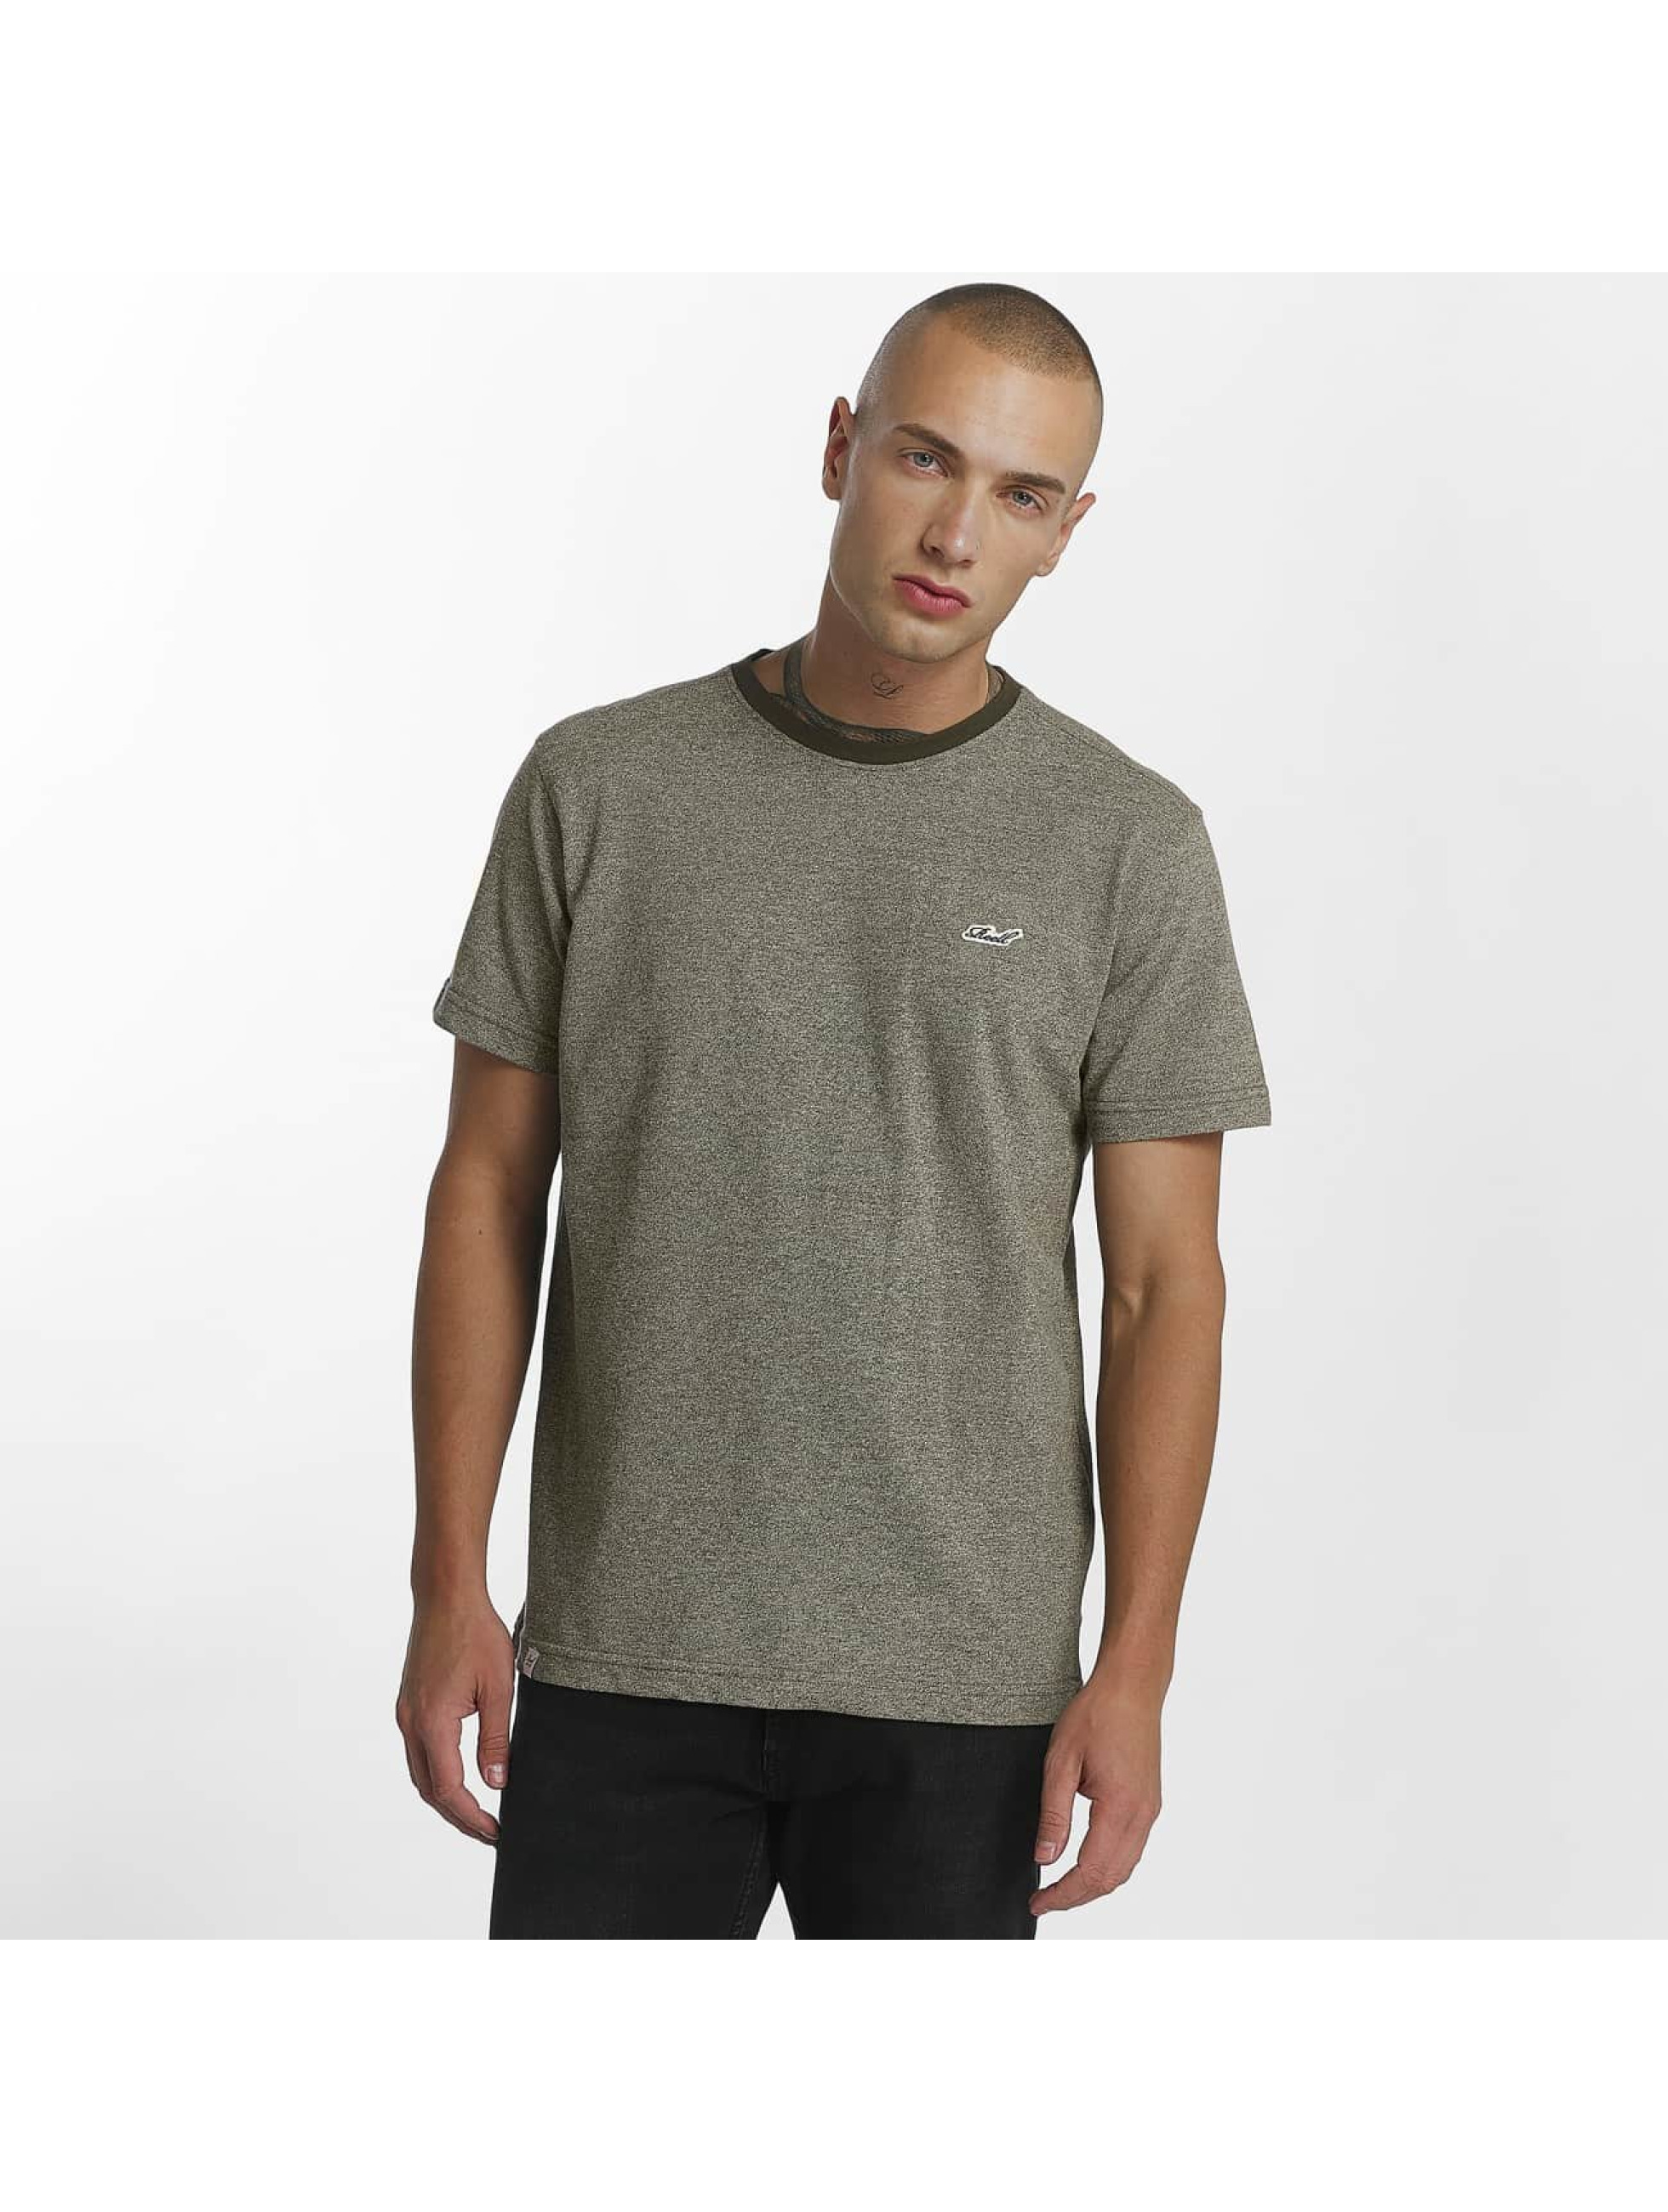 Reell Jeans T-skjorter Pique oliven